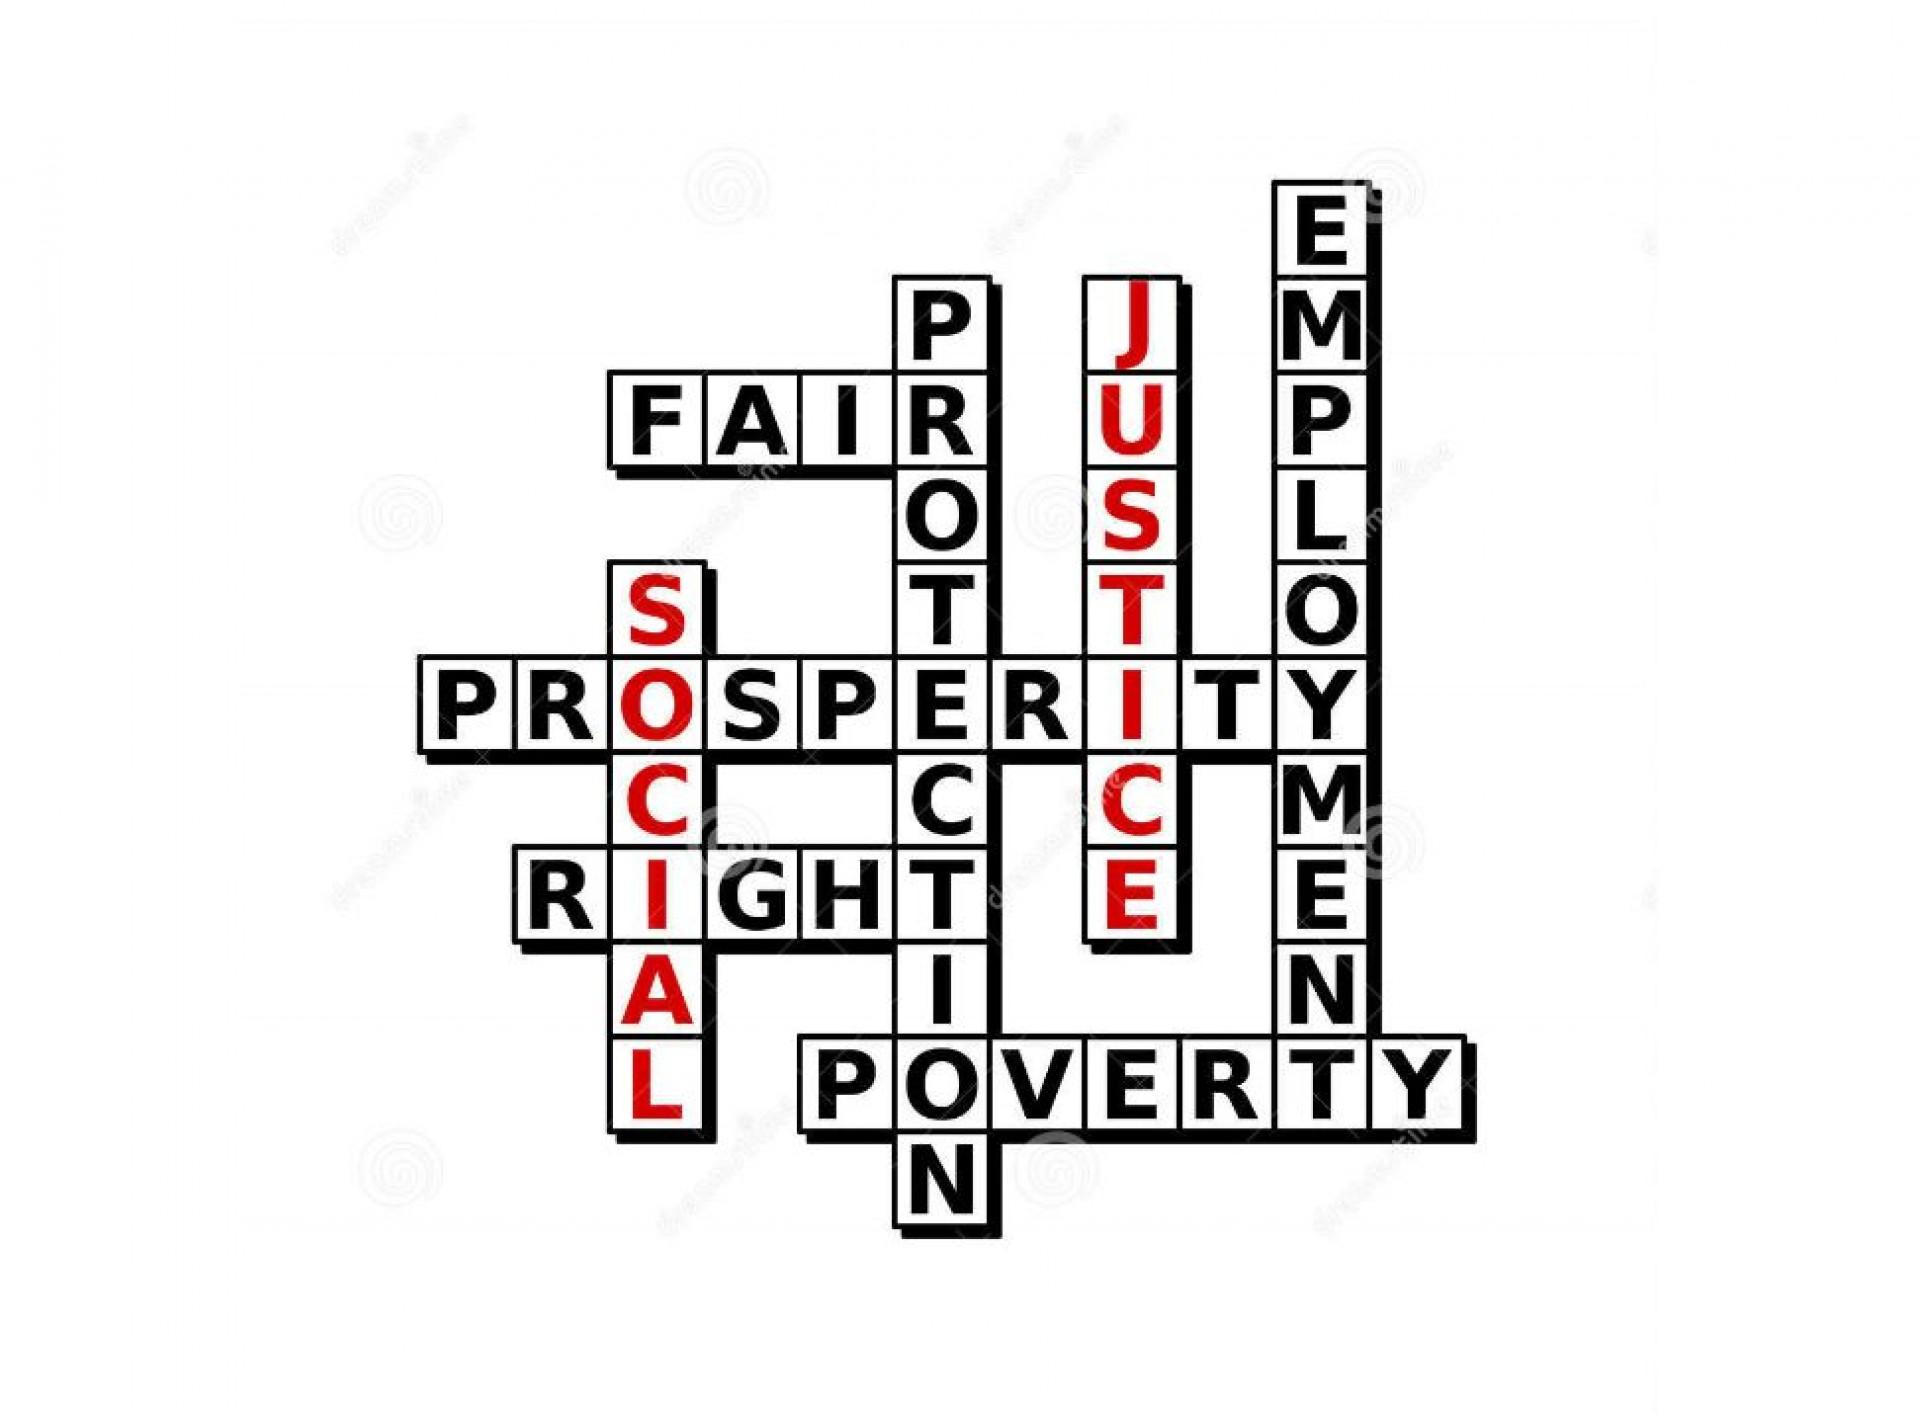 003 Surprising Prosperity Crossword Photo  Clue 6 Letter Material Prosperou 41920